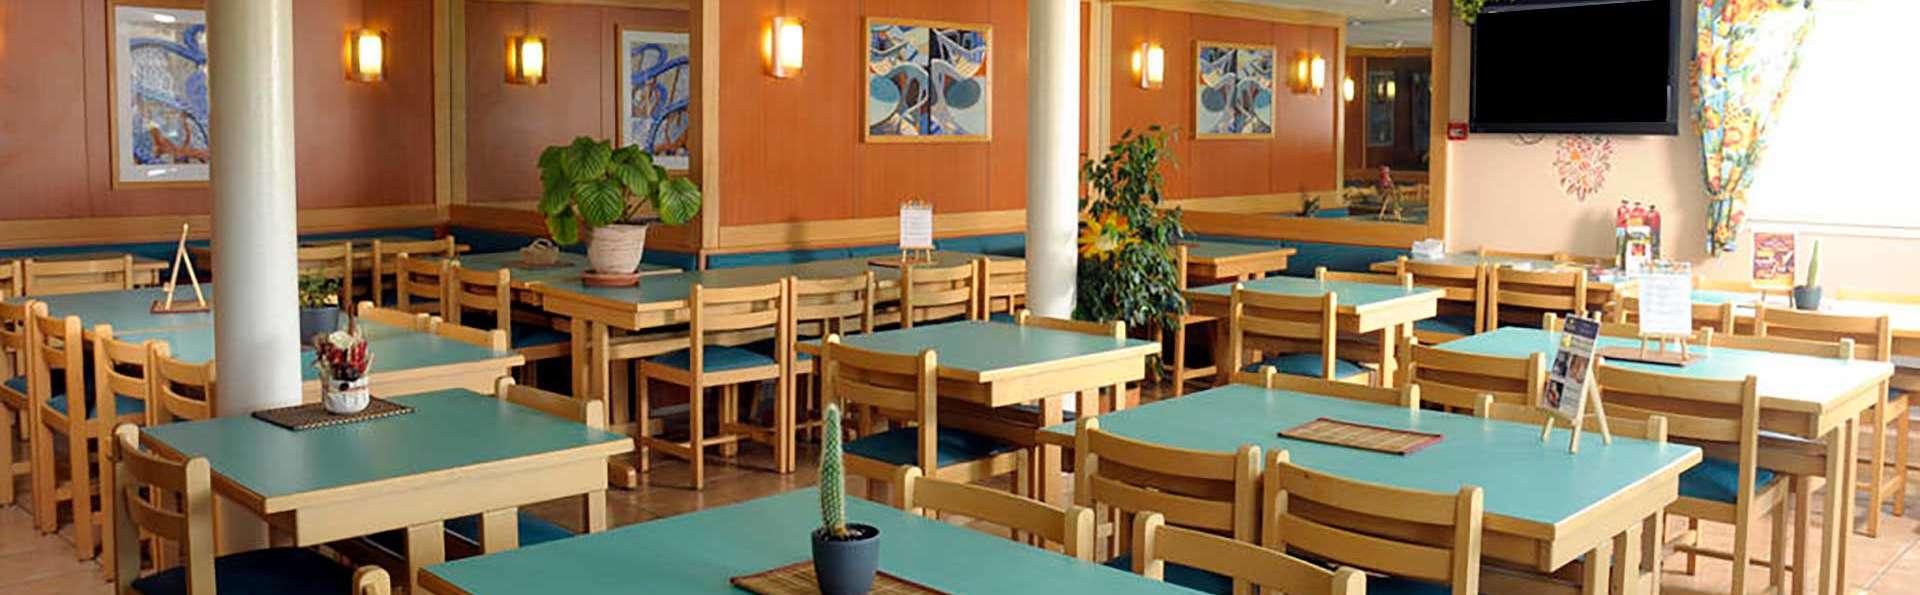 Hôtel Roi Soleil Strasbourg Aéroport - Edit_Restaurant.jpg